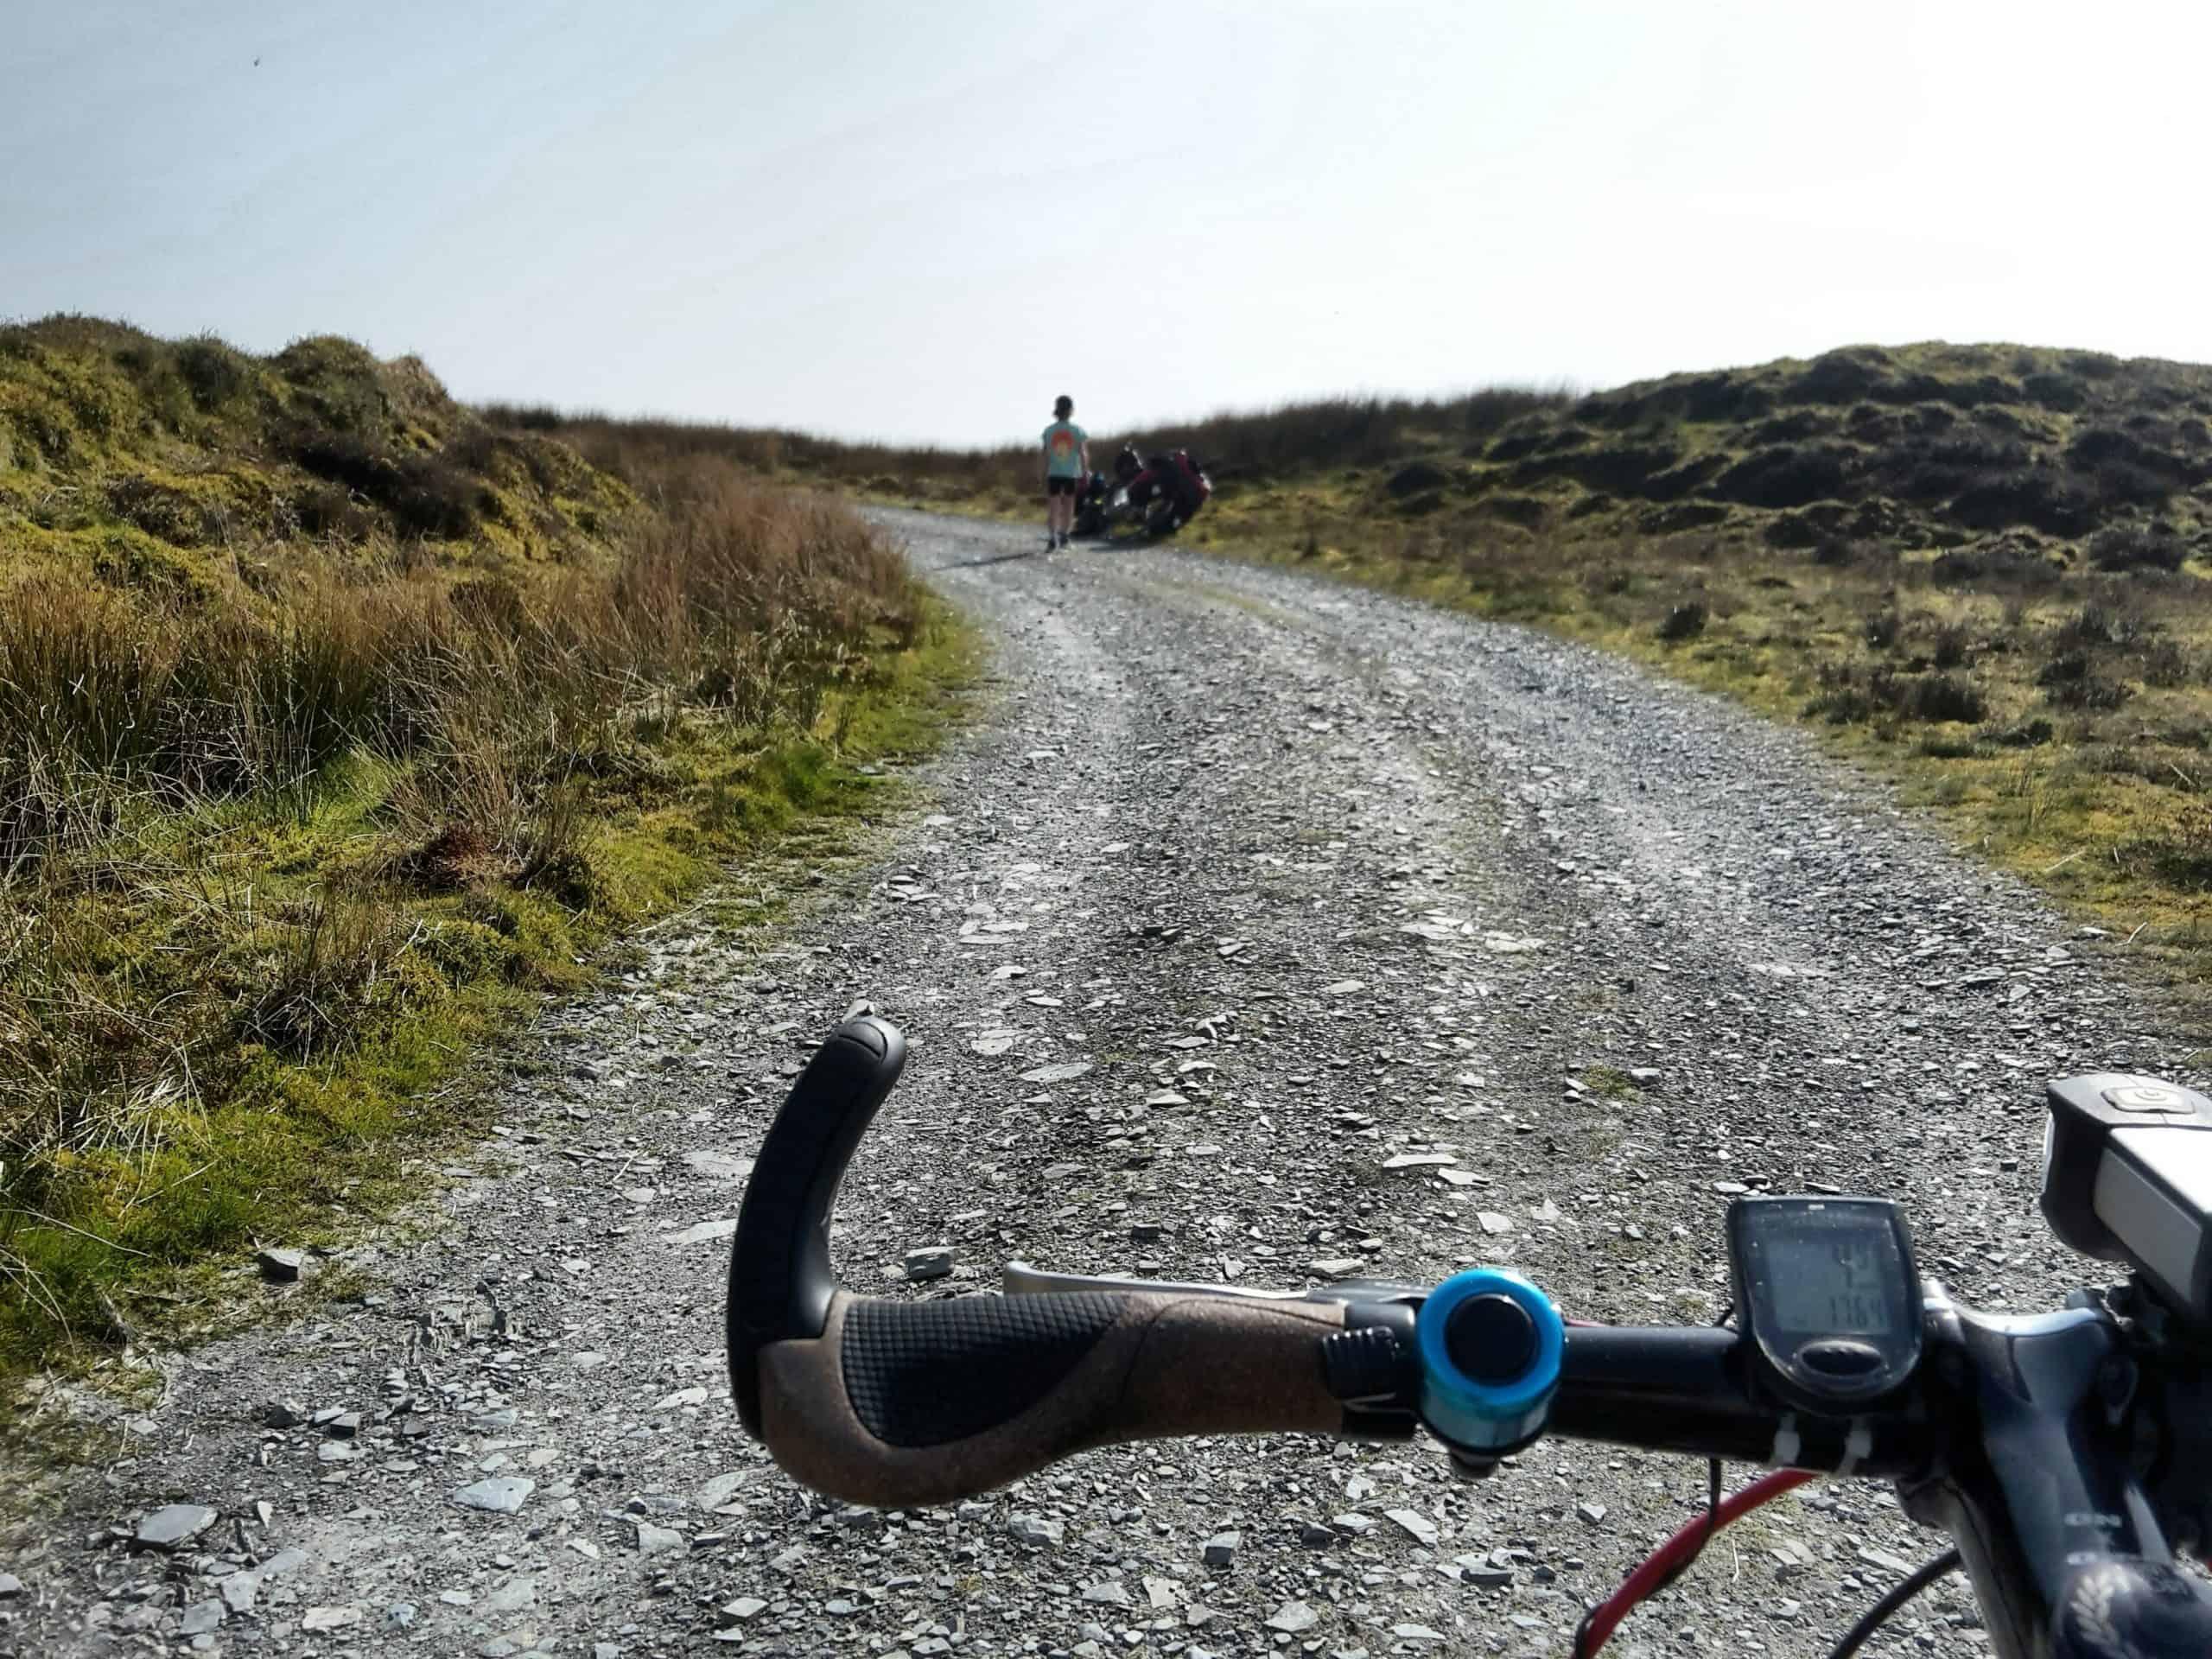 Snowdonia: Climbing Up, Riding Back 91